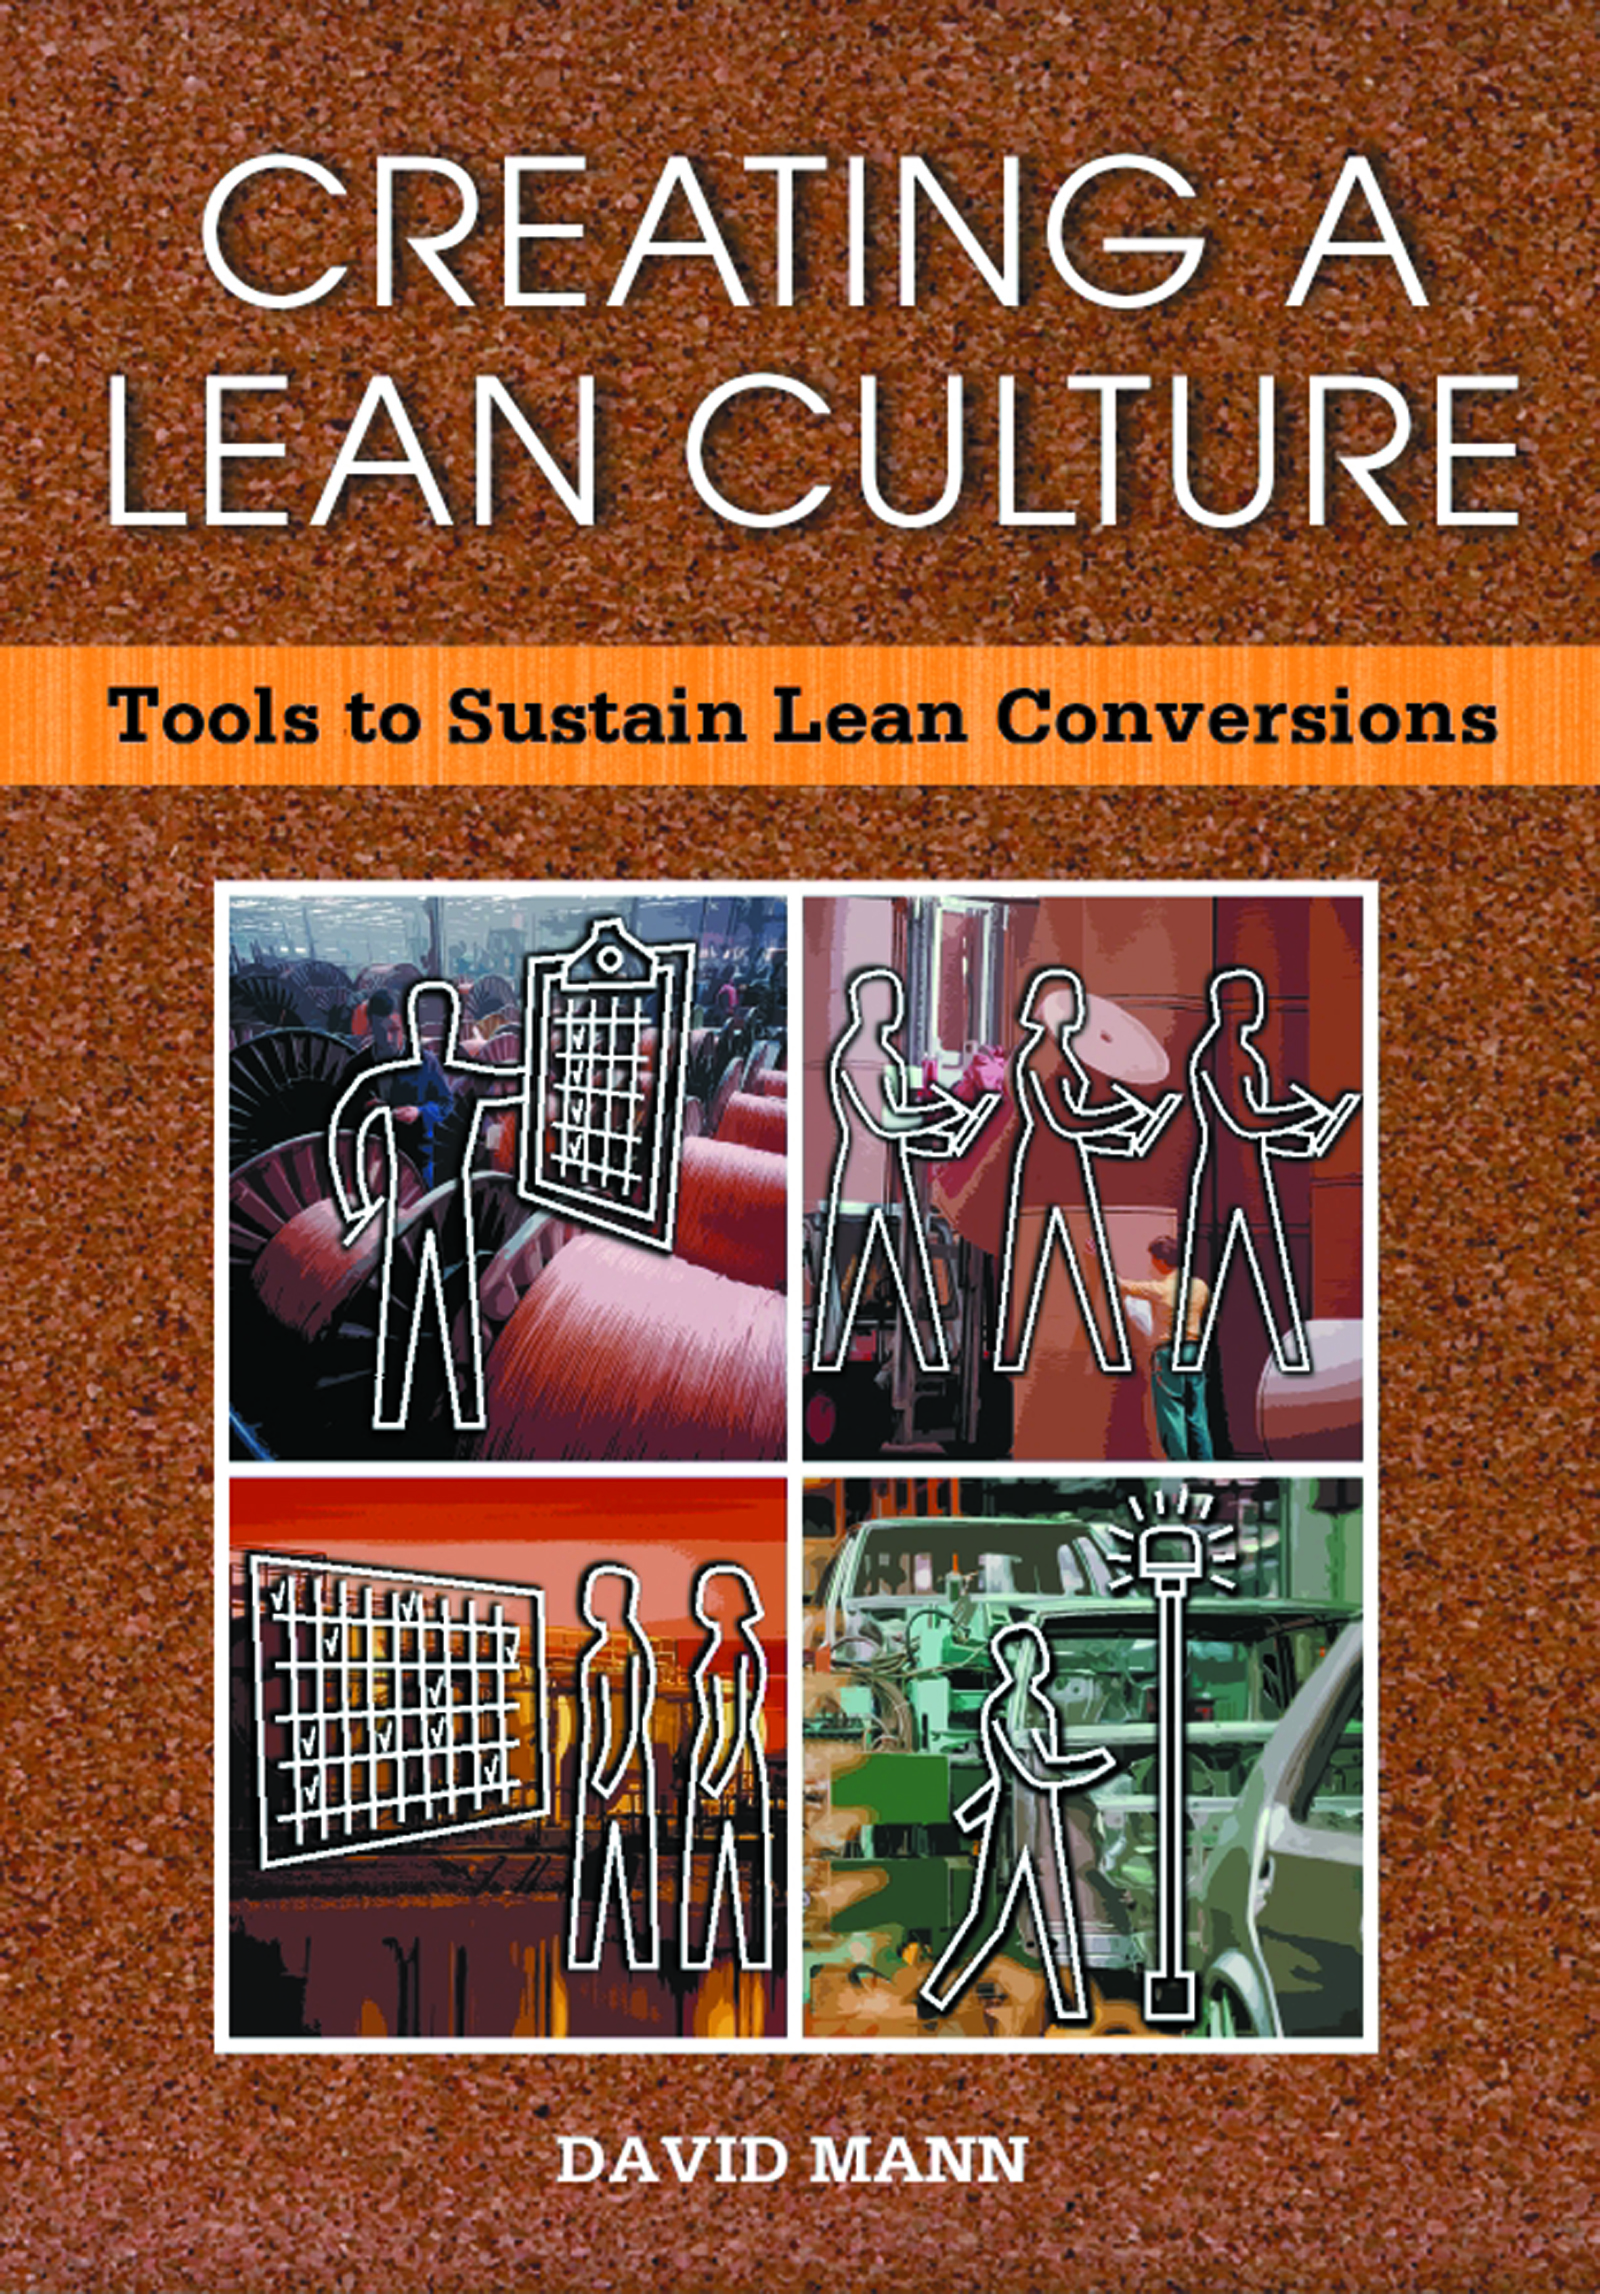 Download Ebook Creating a Lean Culture by David Mann Pdf